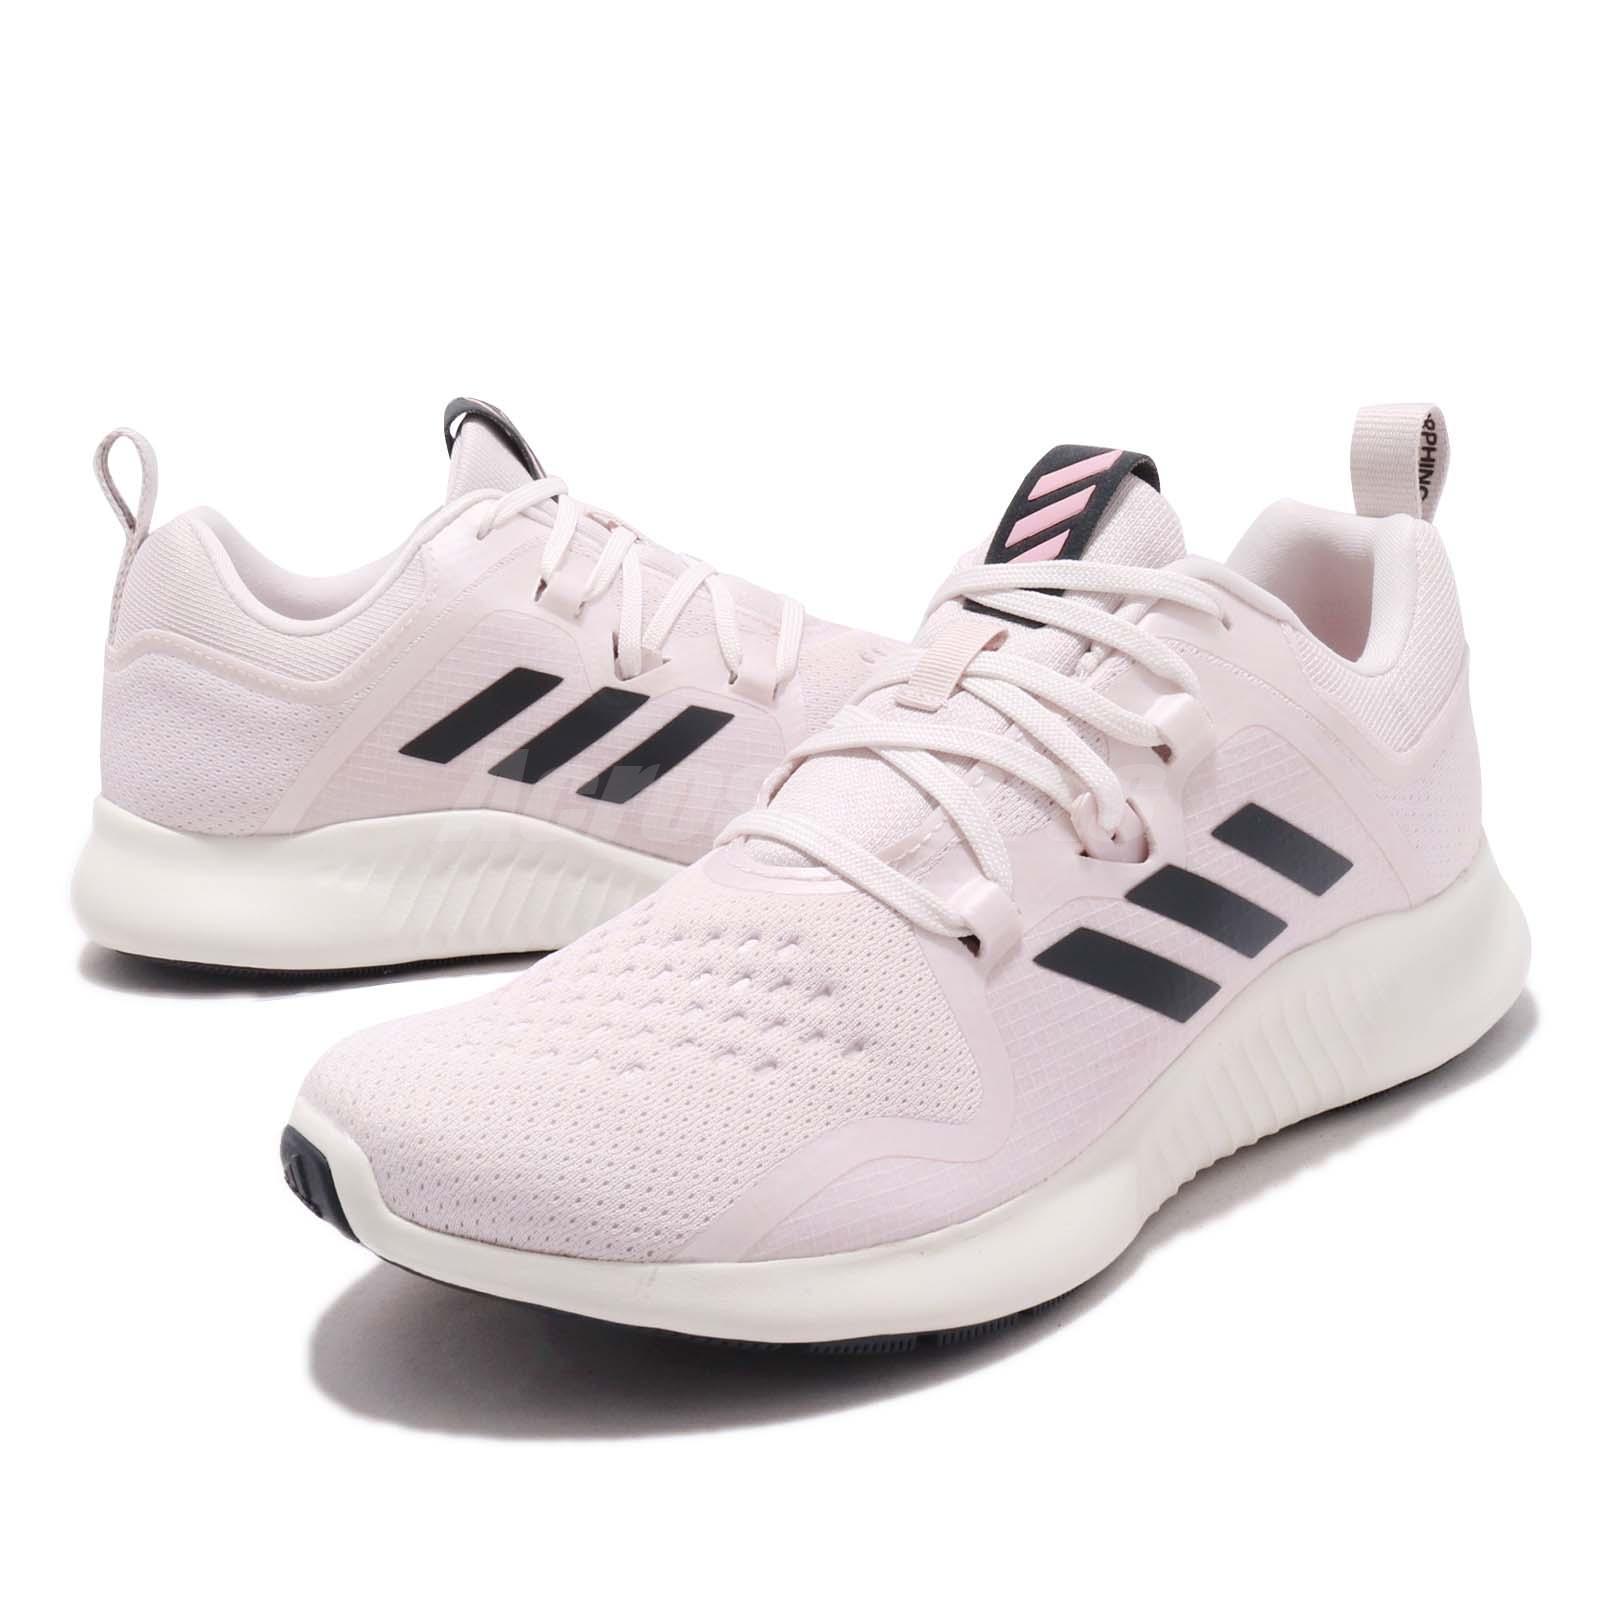 3b7511e3f96c9 Details about adidas Edgebounce W Orchid Tint True Pink Grey Women Running  Shoe Sneaker F99879